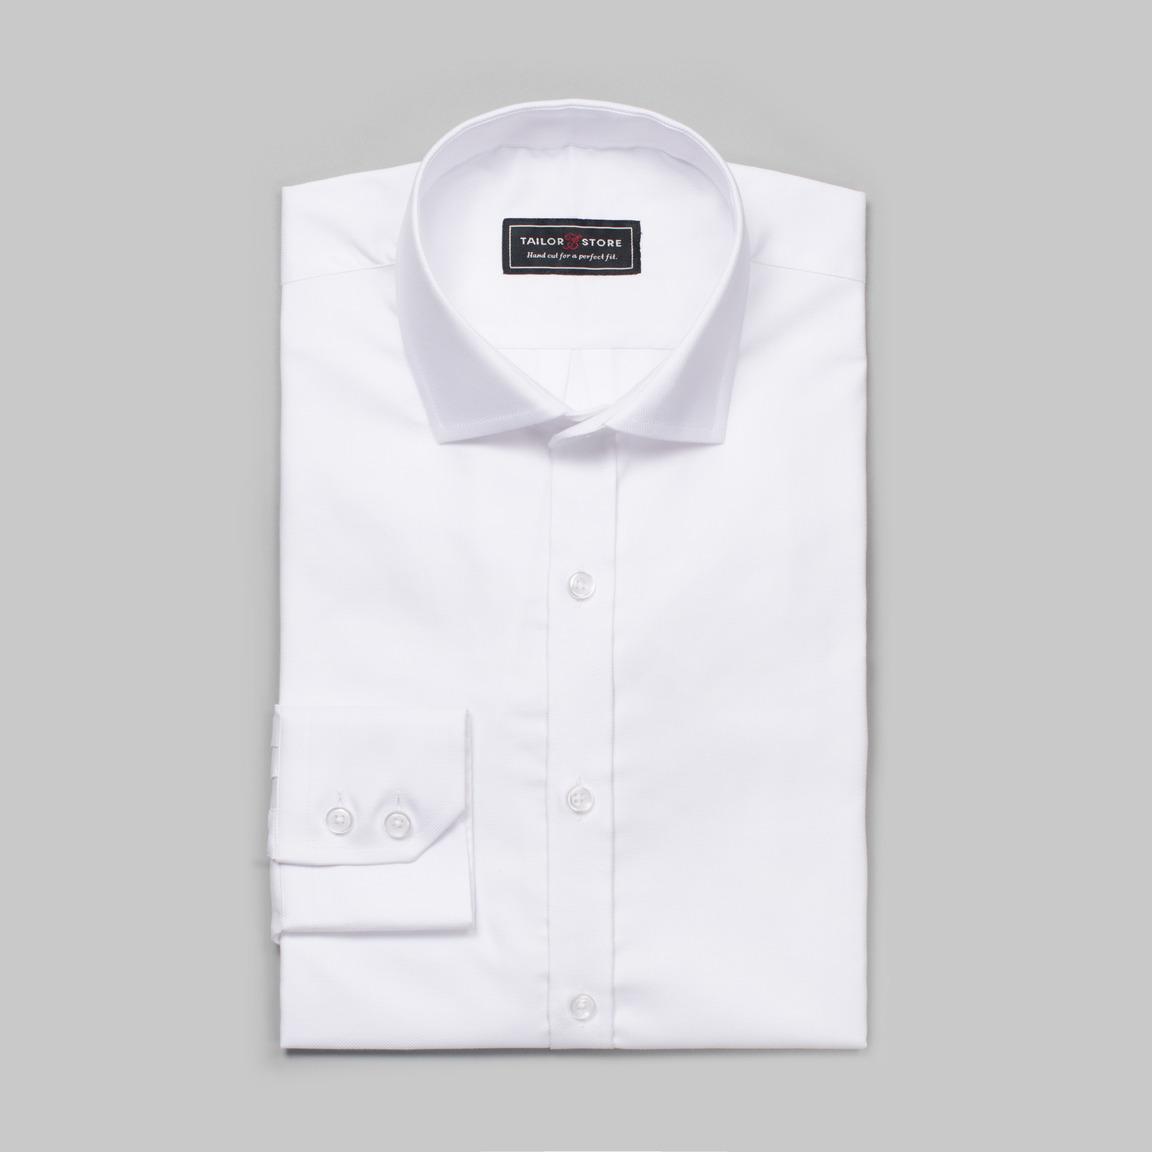 White Oxford cut-away shirt